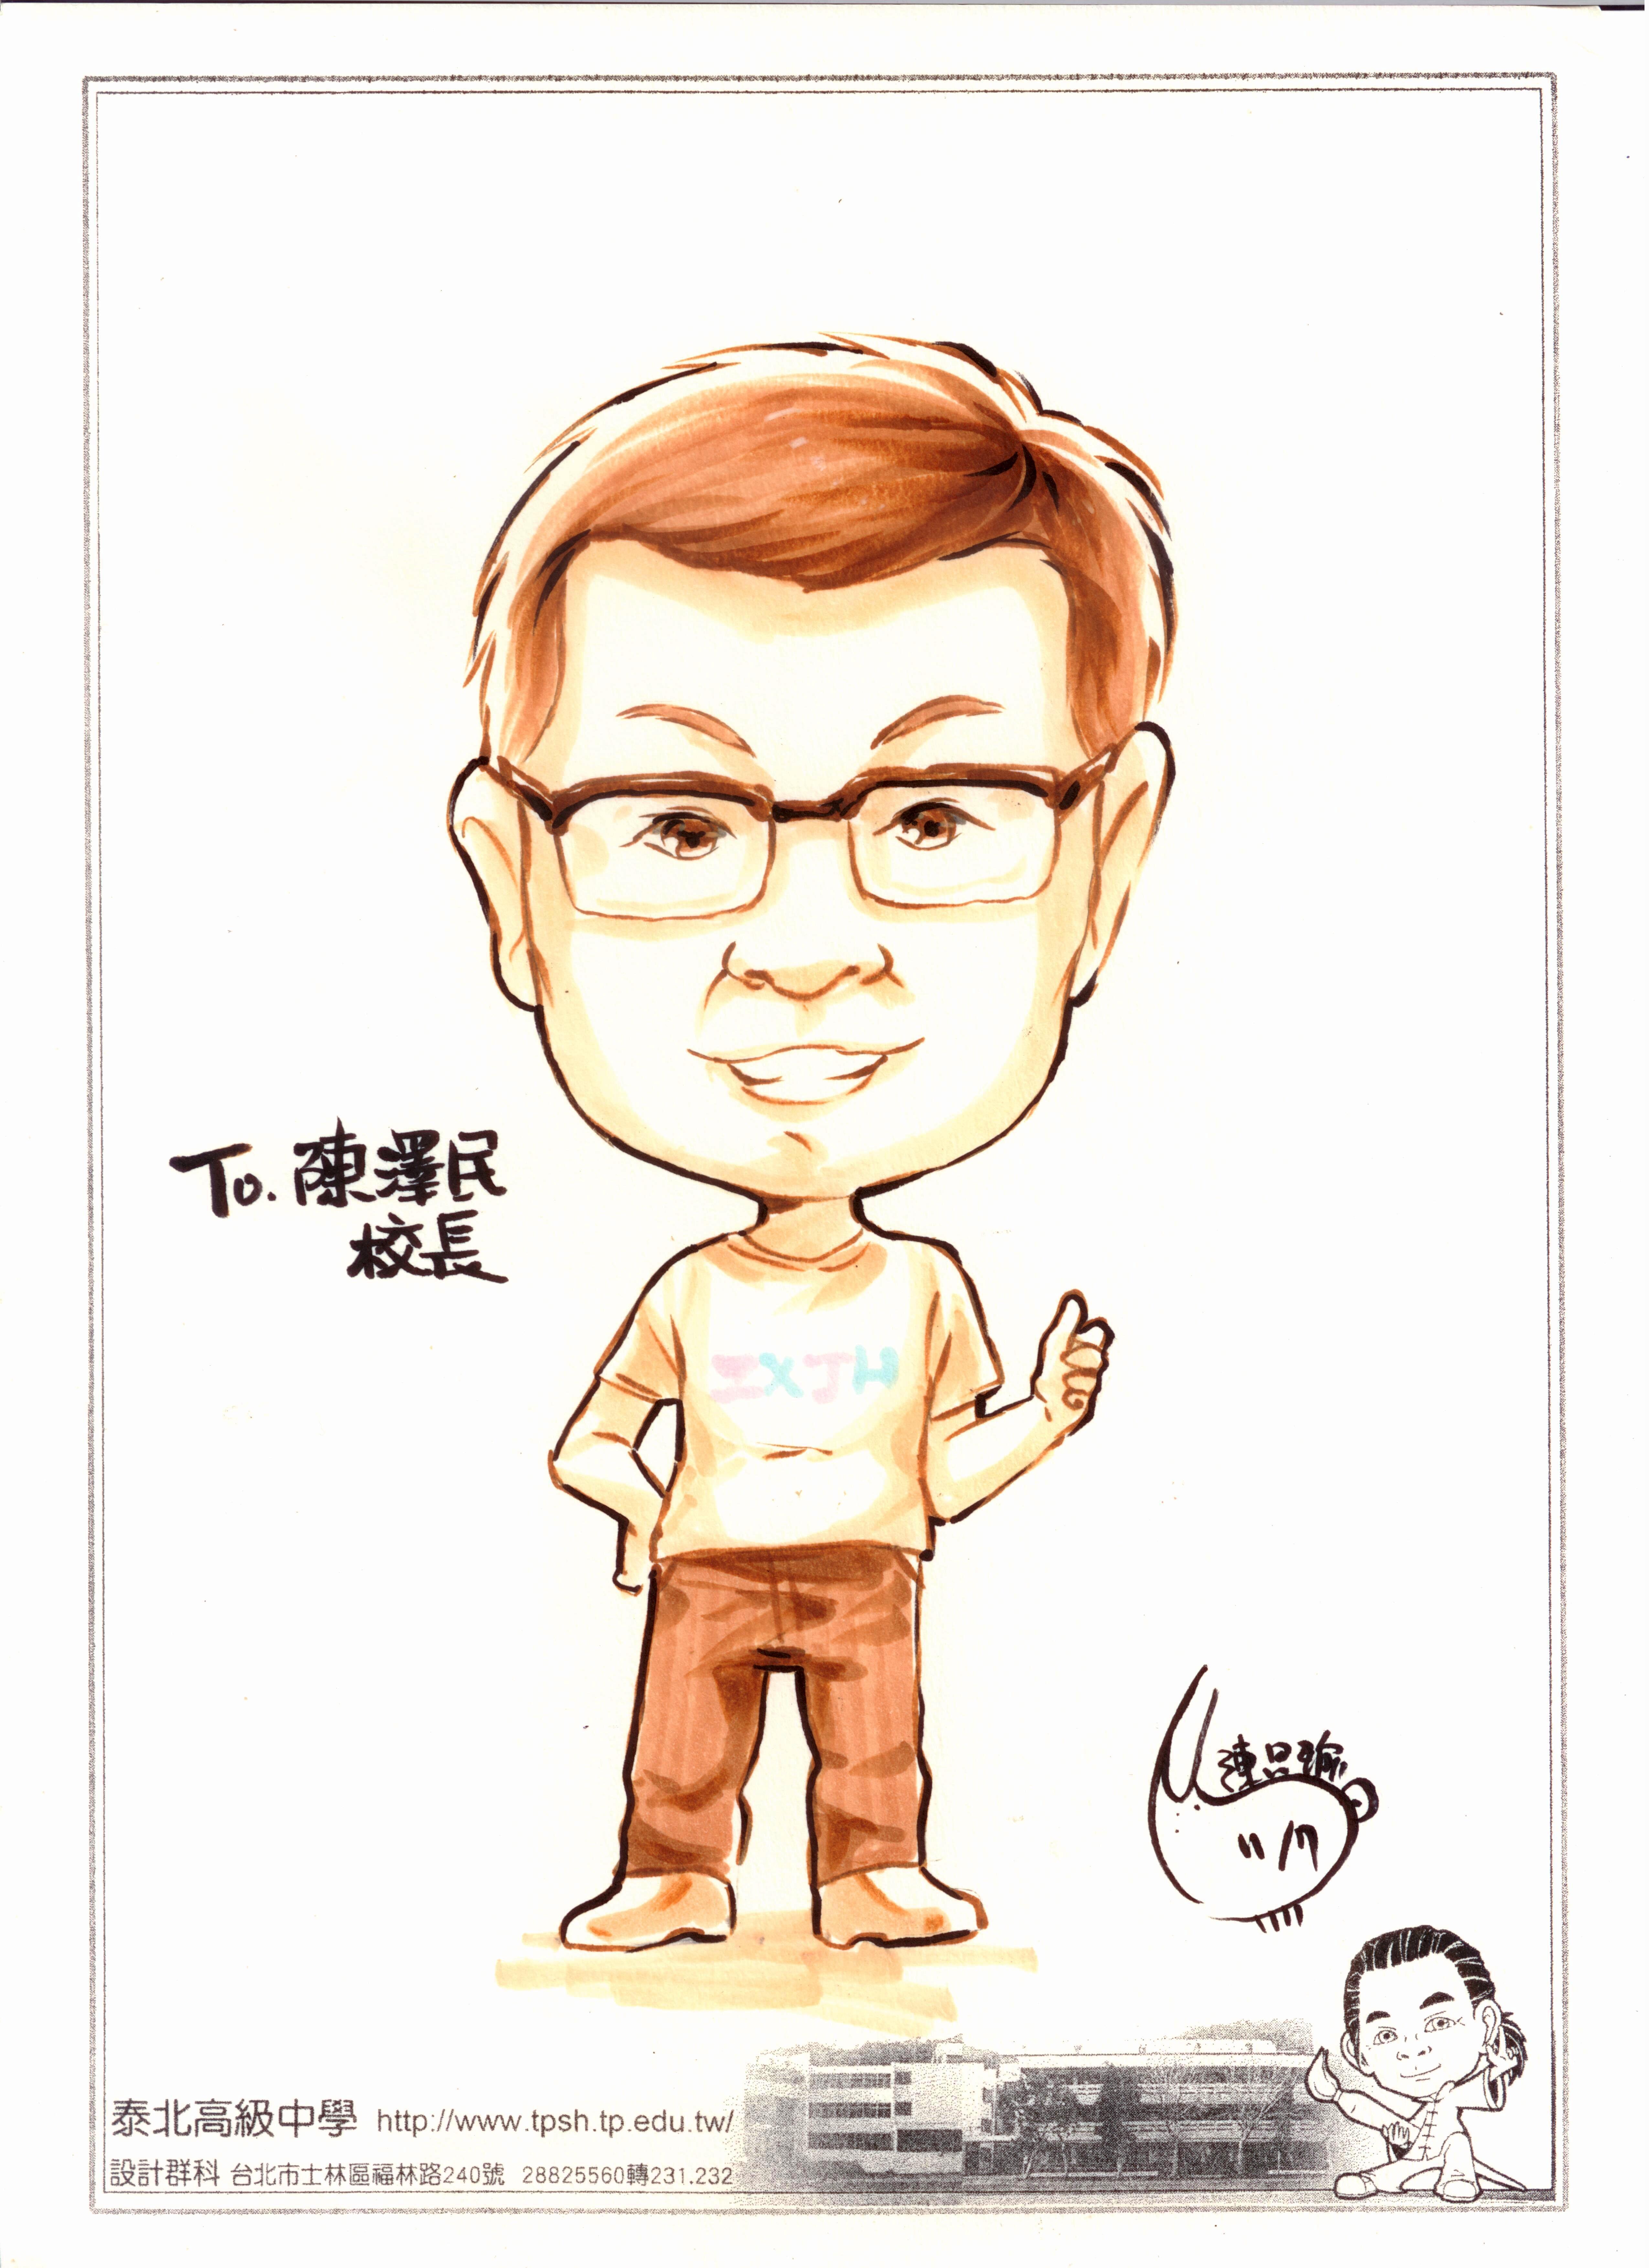 陳澤民校長